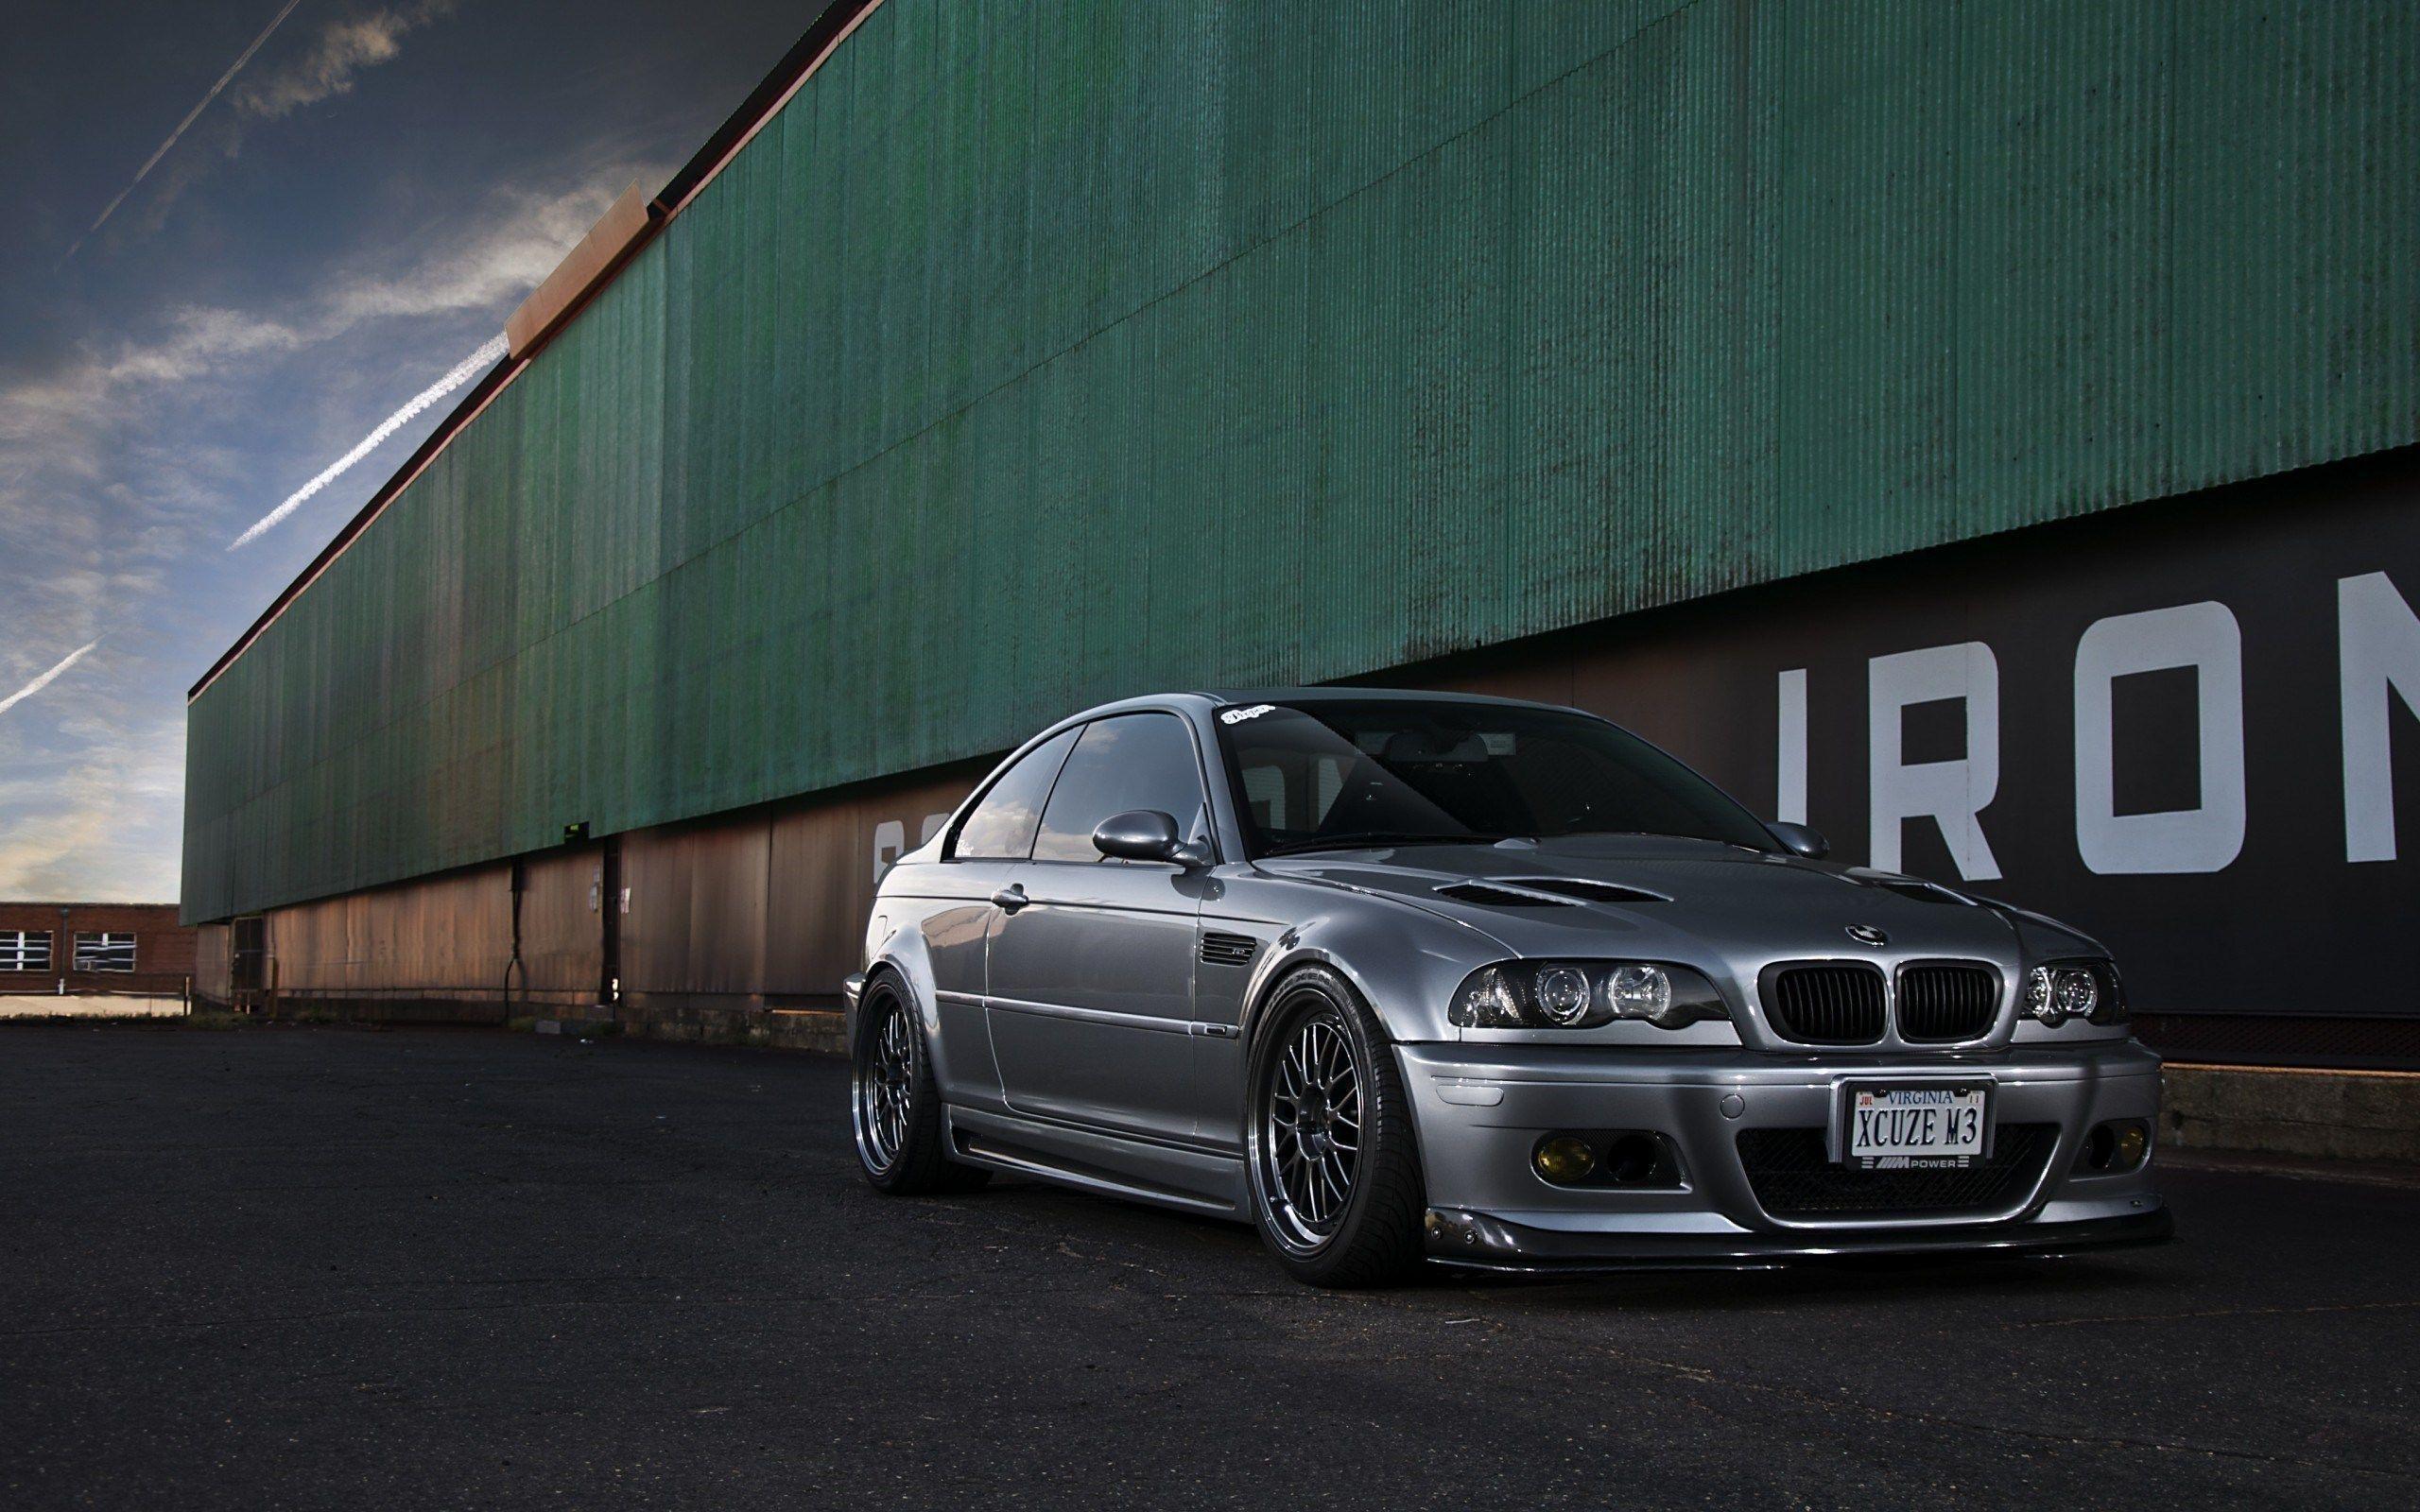 BMW M3 E46 Wallpaper 69 images 2560x1600